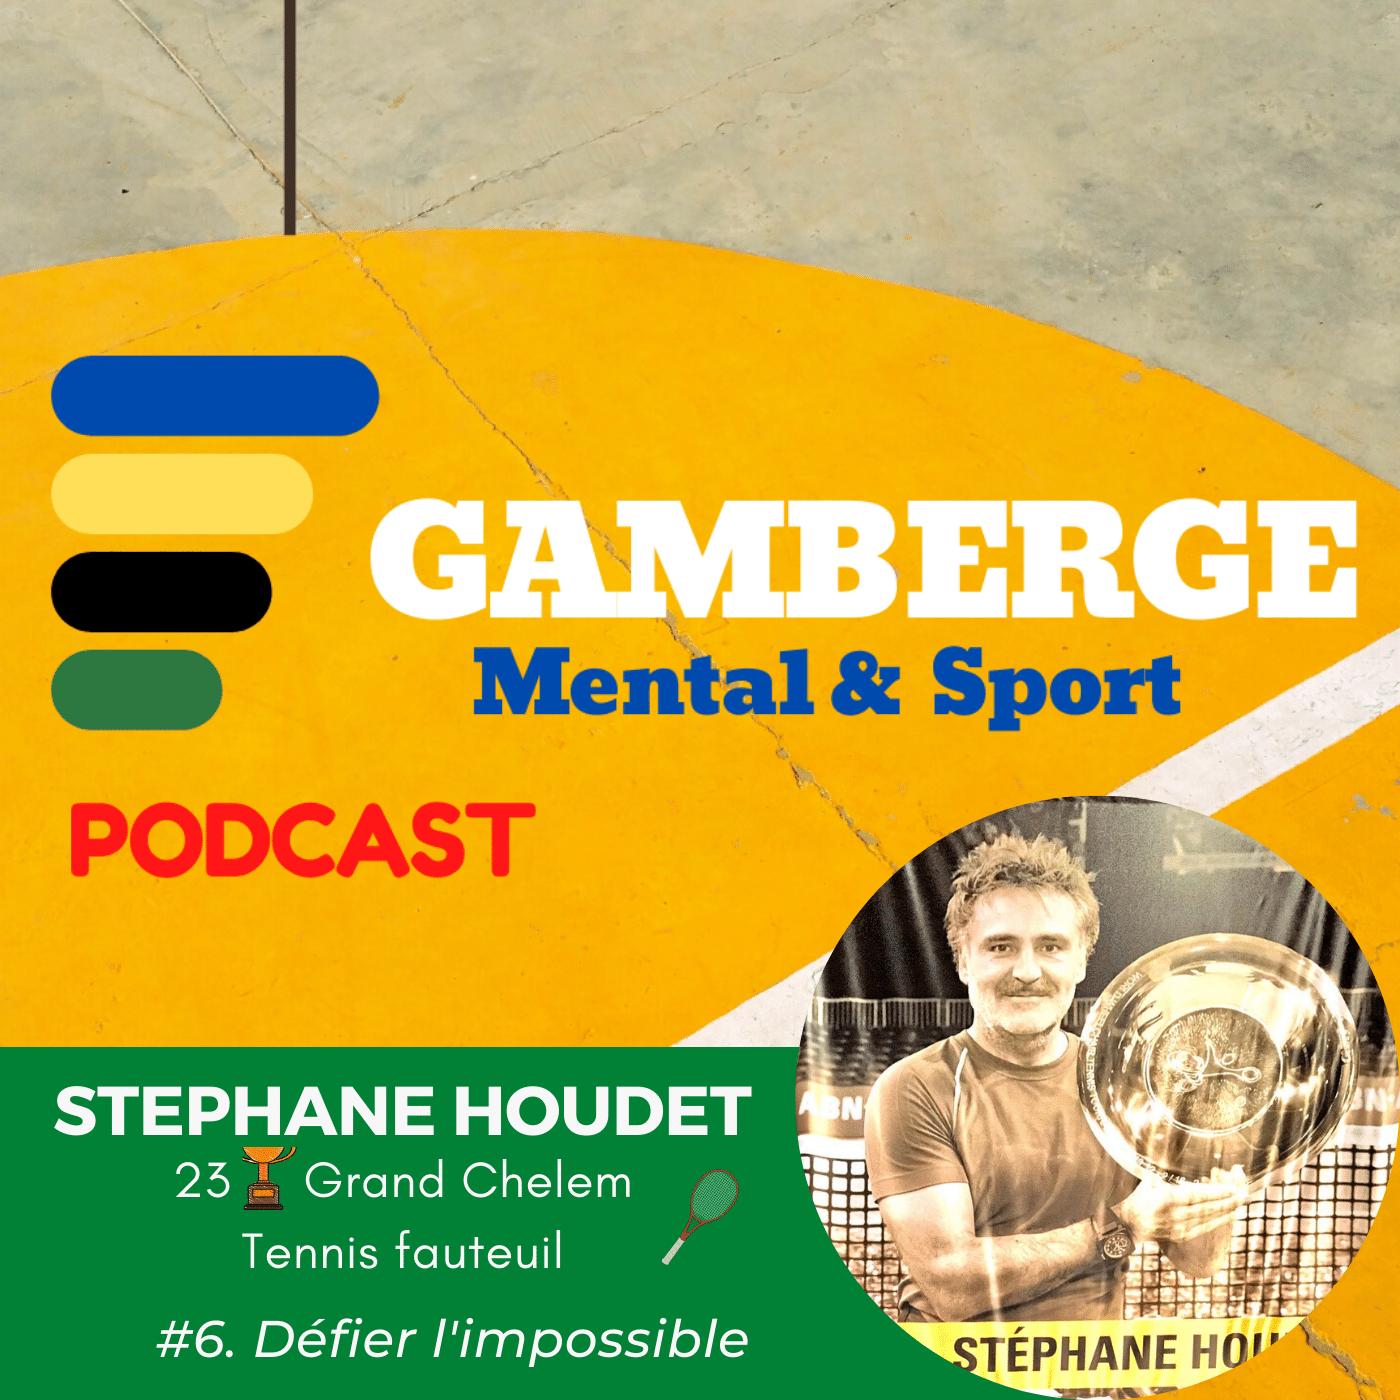 Stephane Houdet: Défier l'impossible